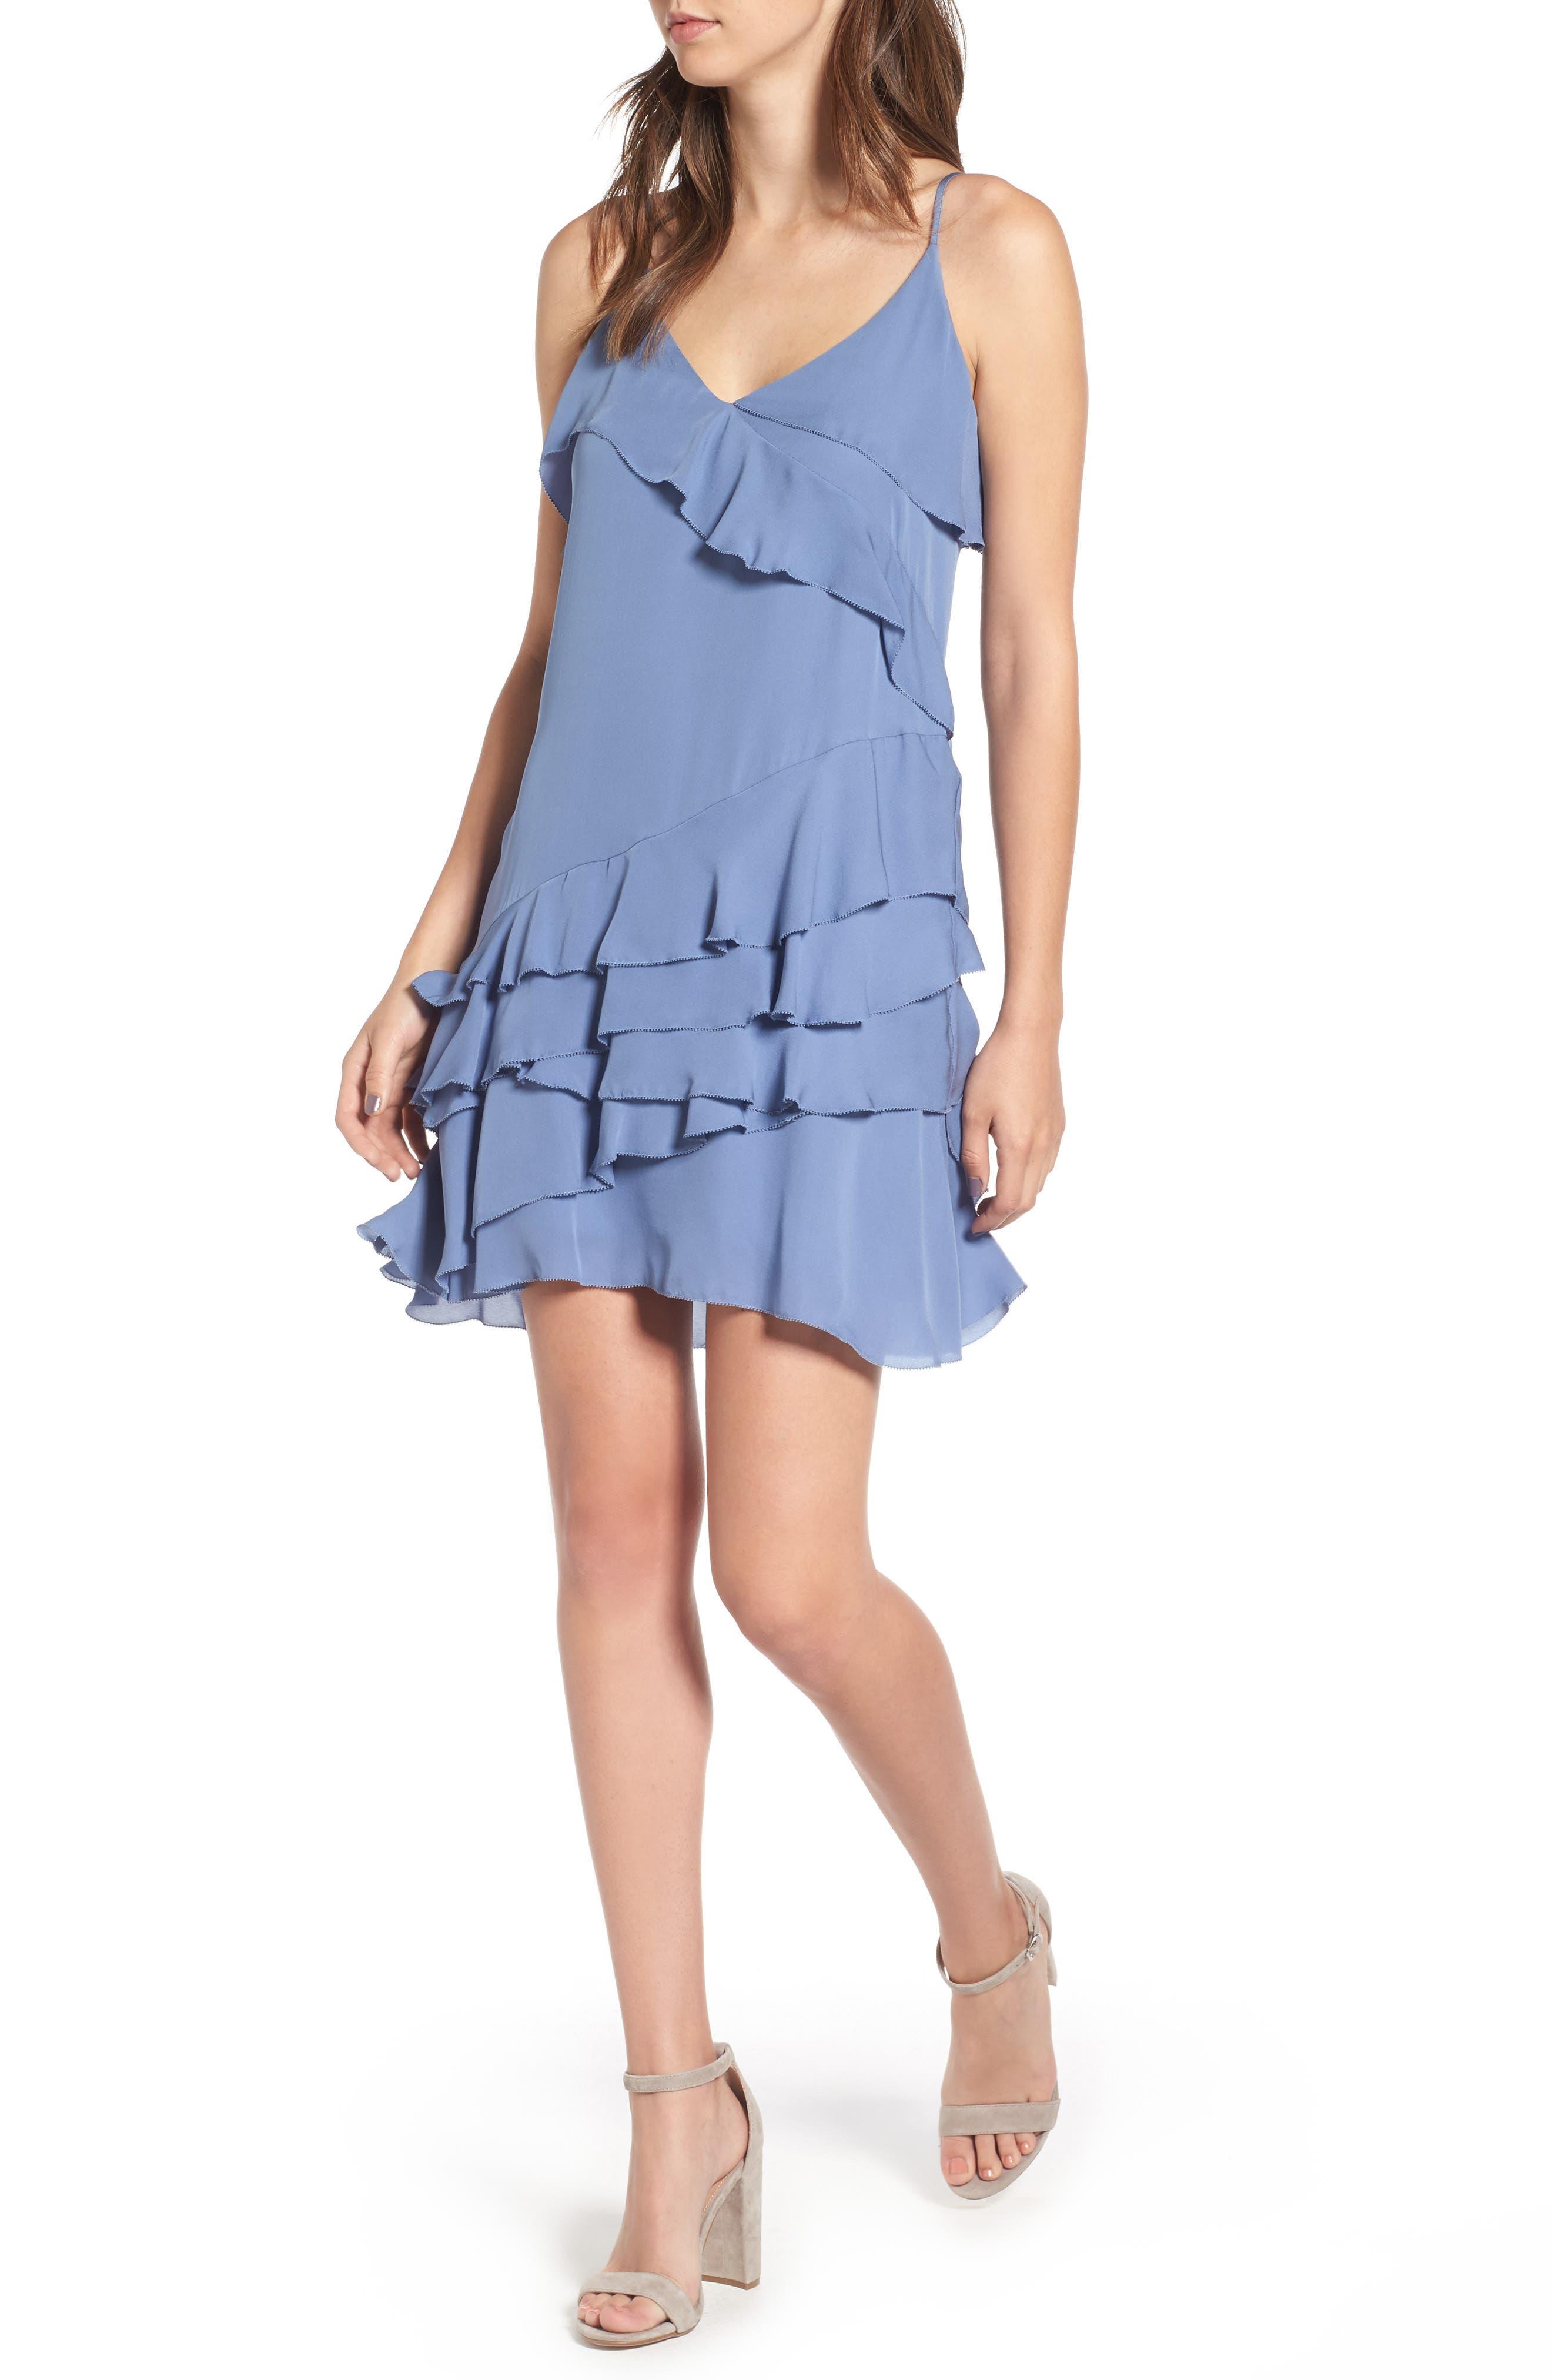 Parker Athens Dress